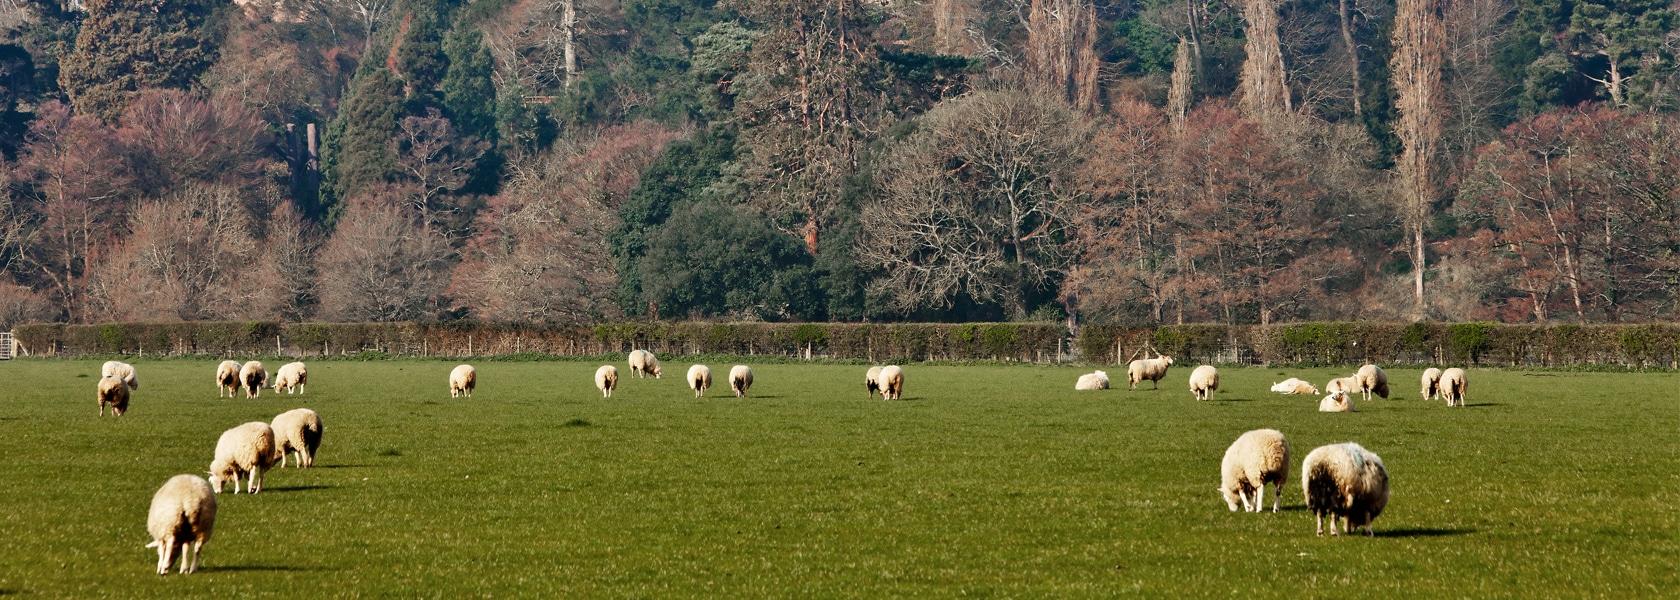 Sheep_Dunster_Castle_1680px